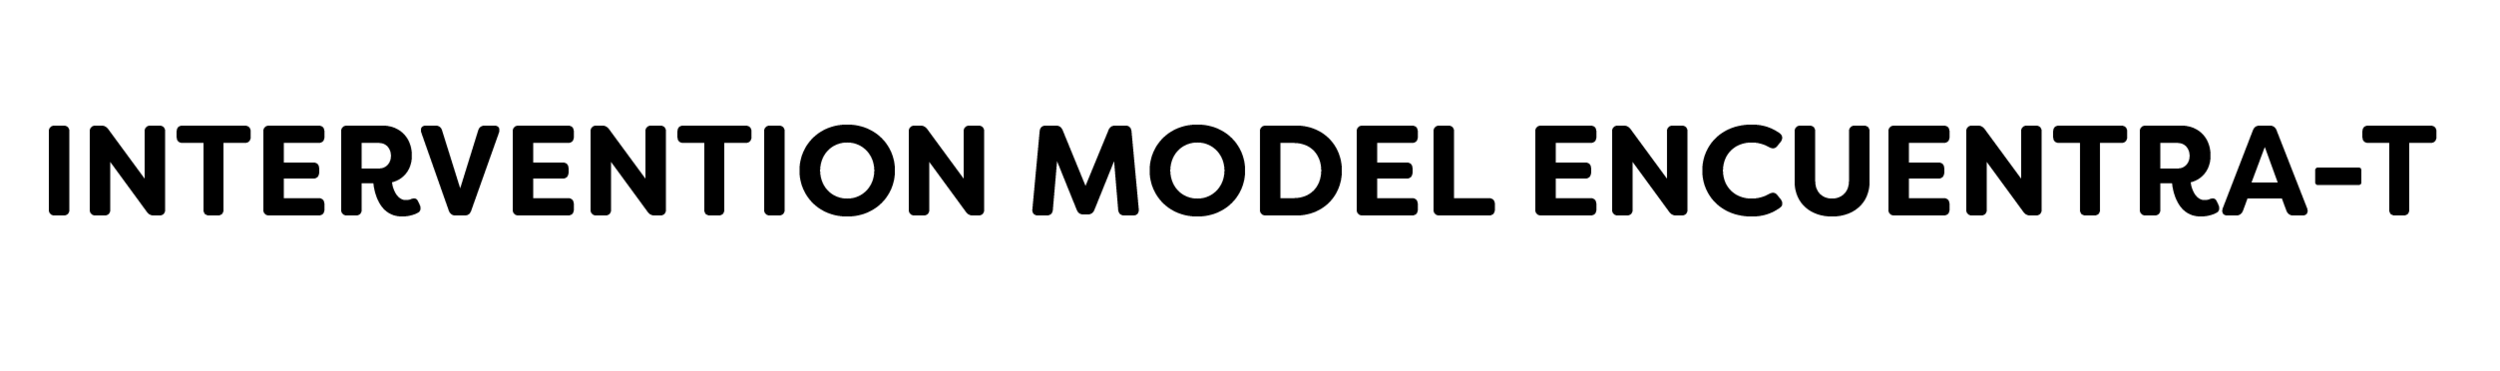 MODELO INTjpg-03.jpg